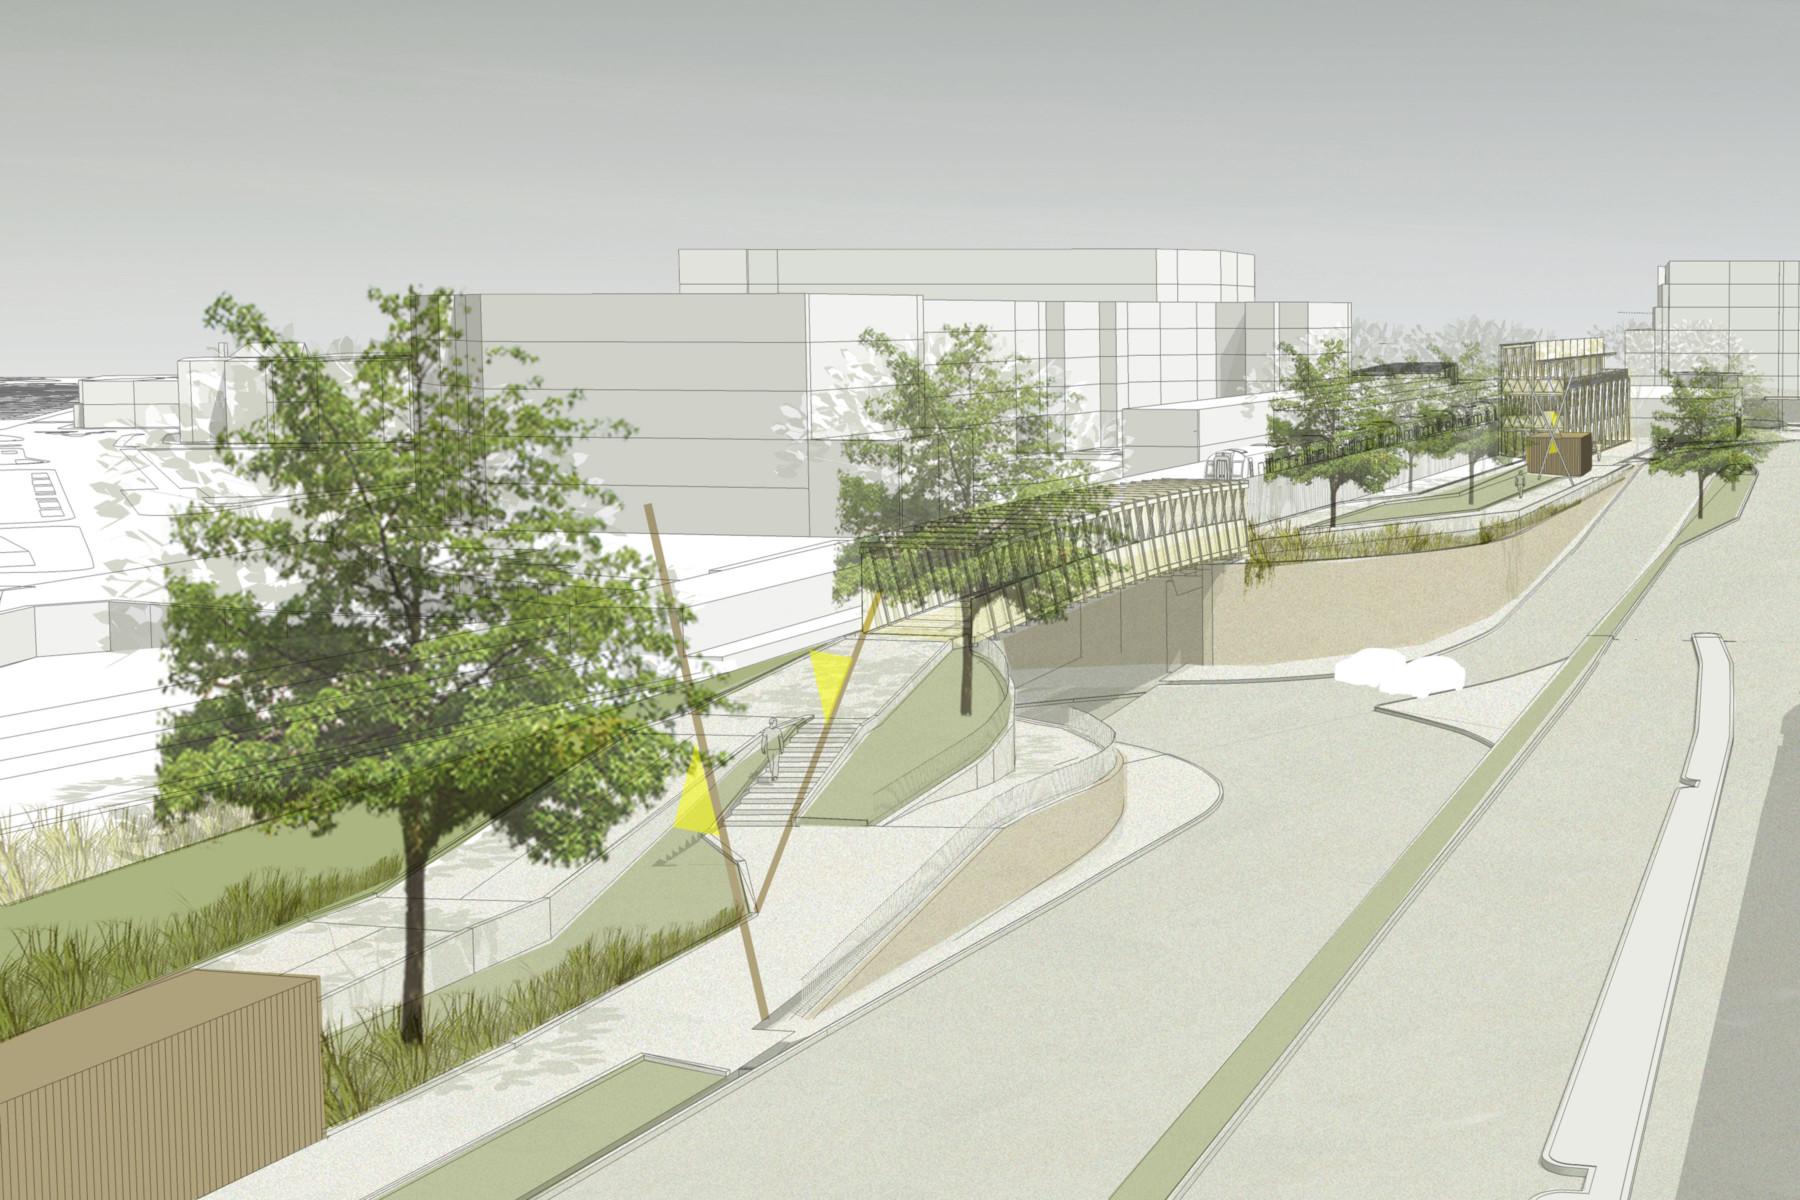 Sarah-Wigglesworth-Architects Kingston-Mini-Holland Bridge 5 Aerial 3600